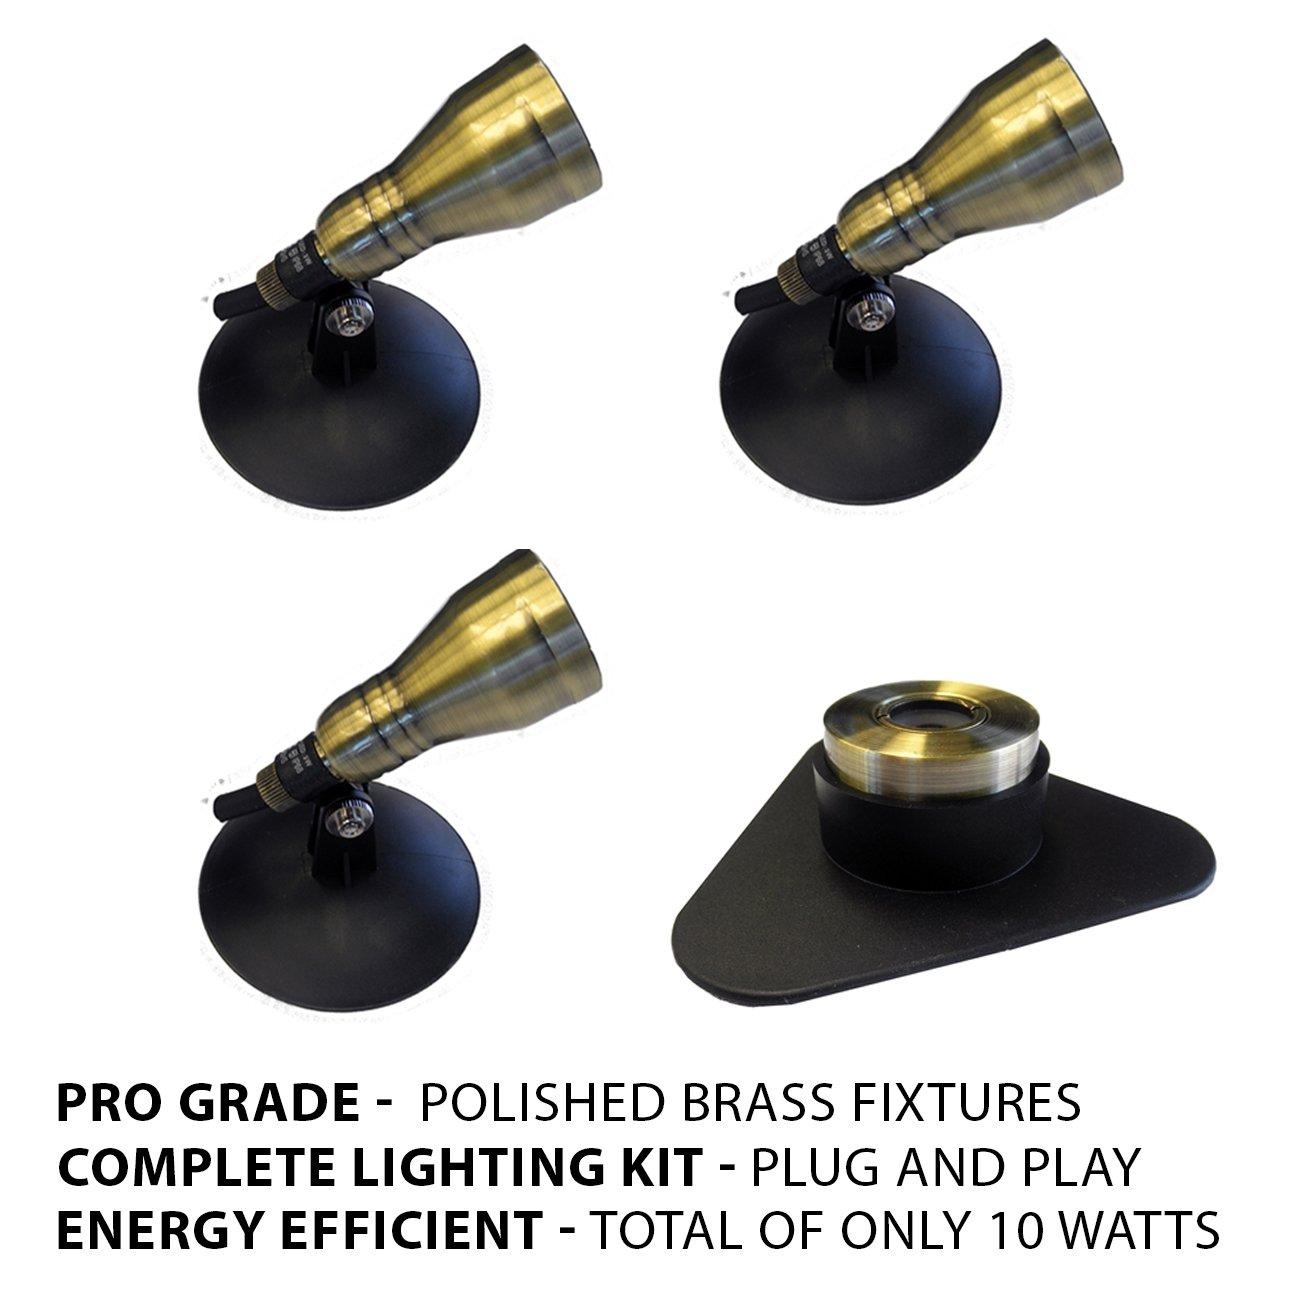 Patriot Brass LED Waterproof Pond and Landscape Lighting 10 Watt Light Kit P-B3 by Patriot